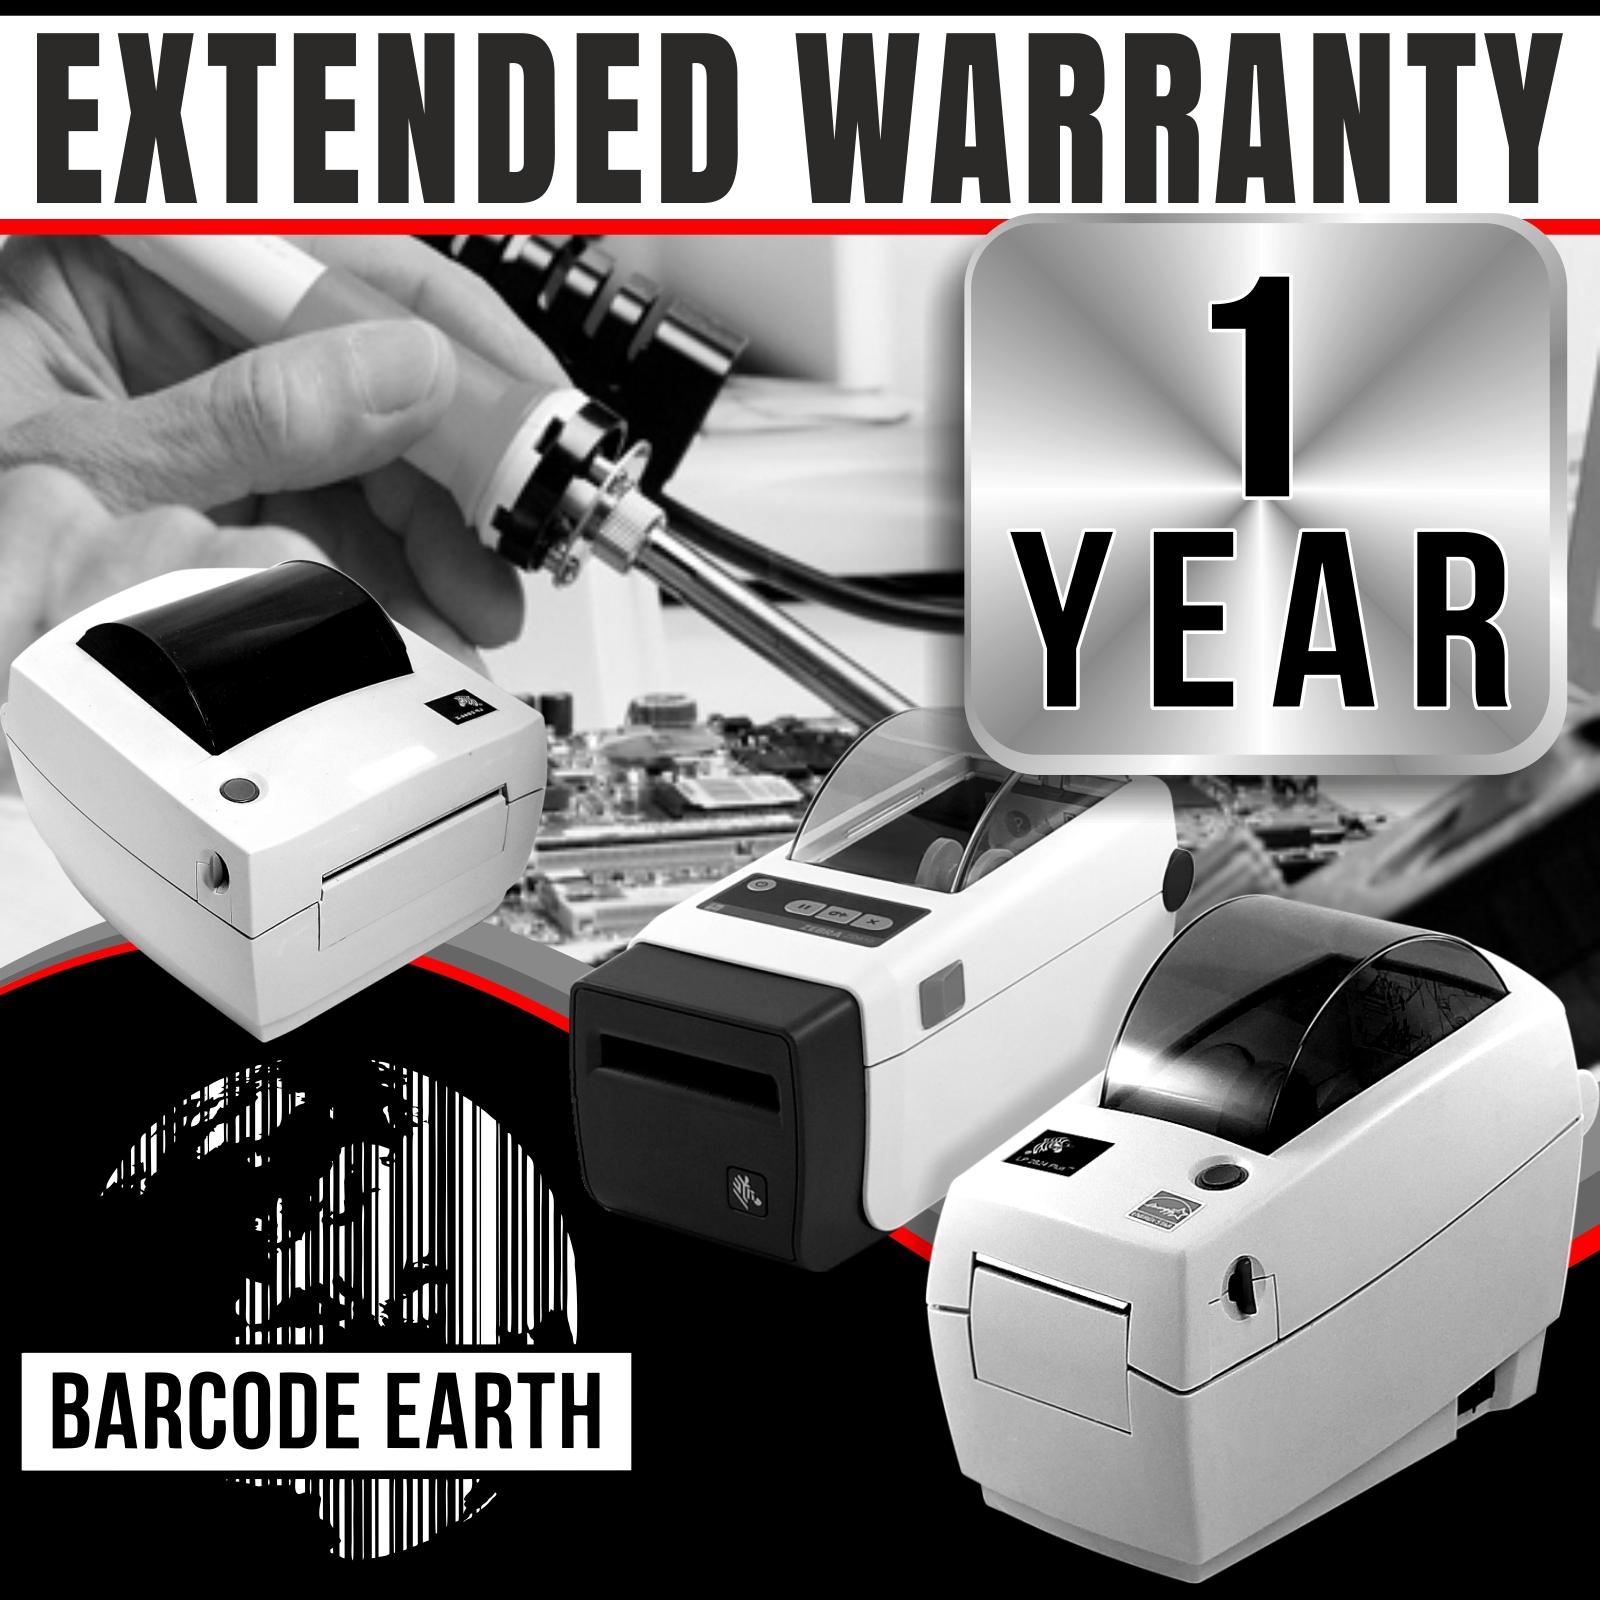 Zebra GK420d Extended Warranty Service Agreement - 1 Year